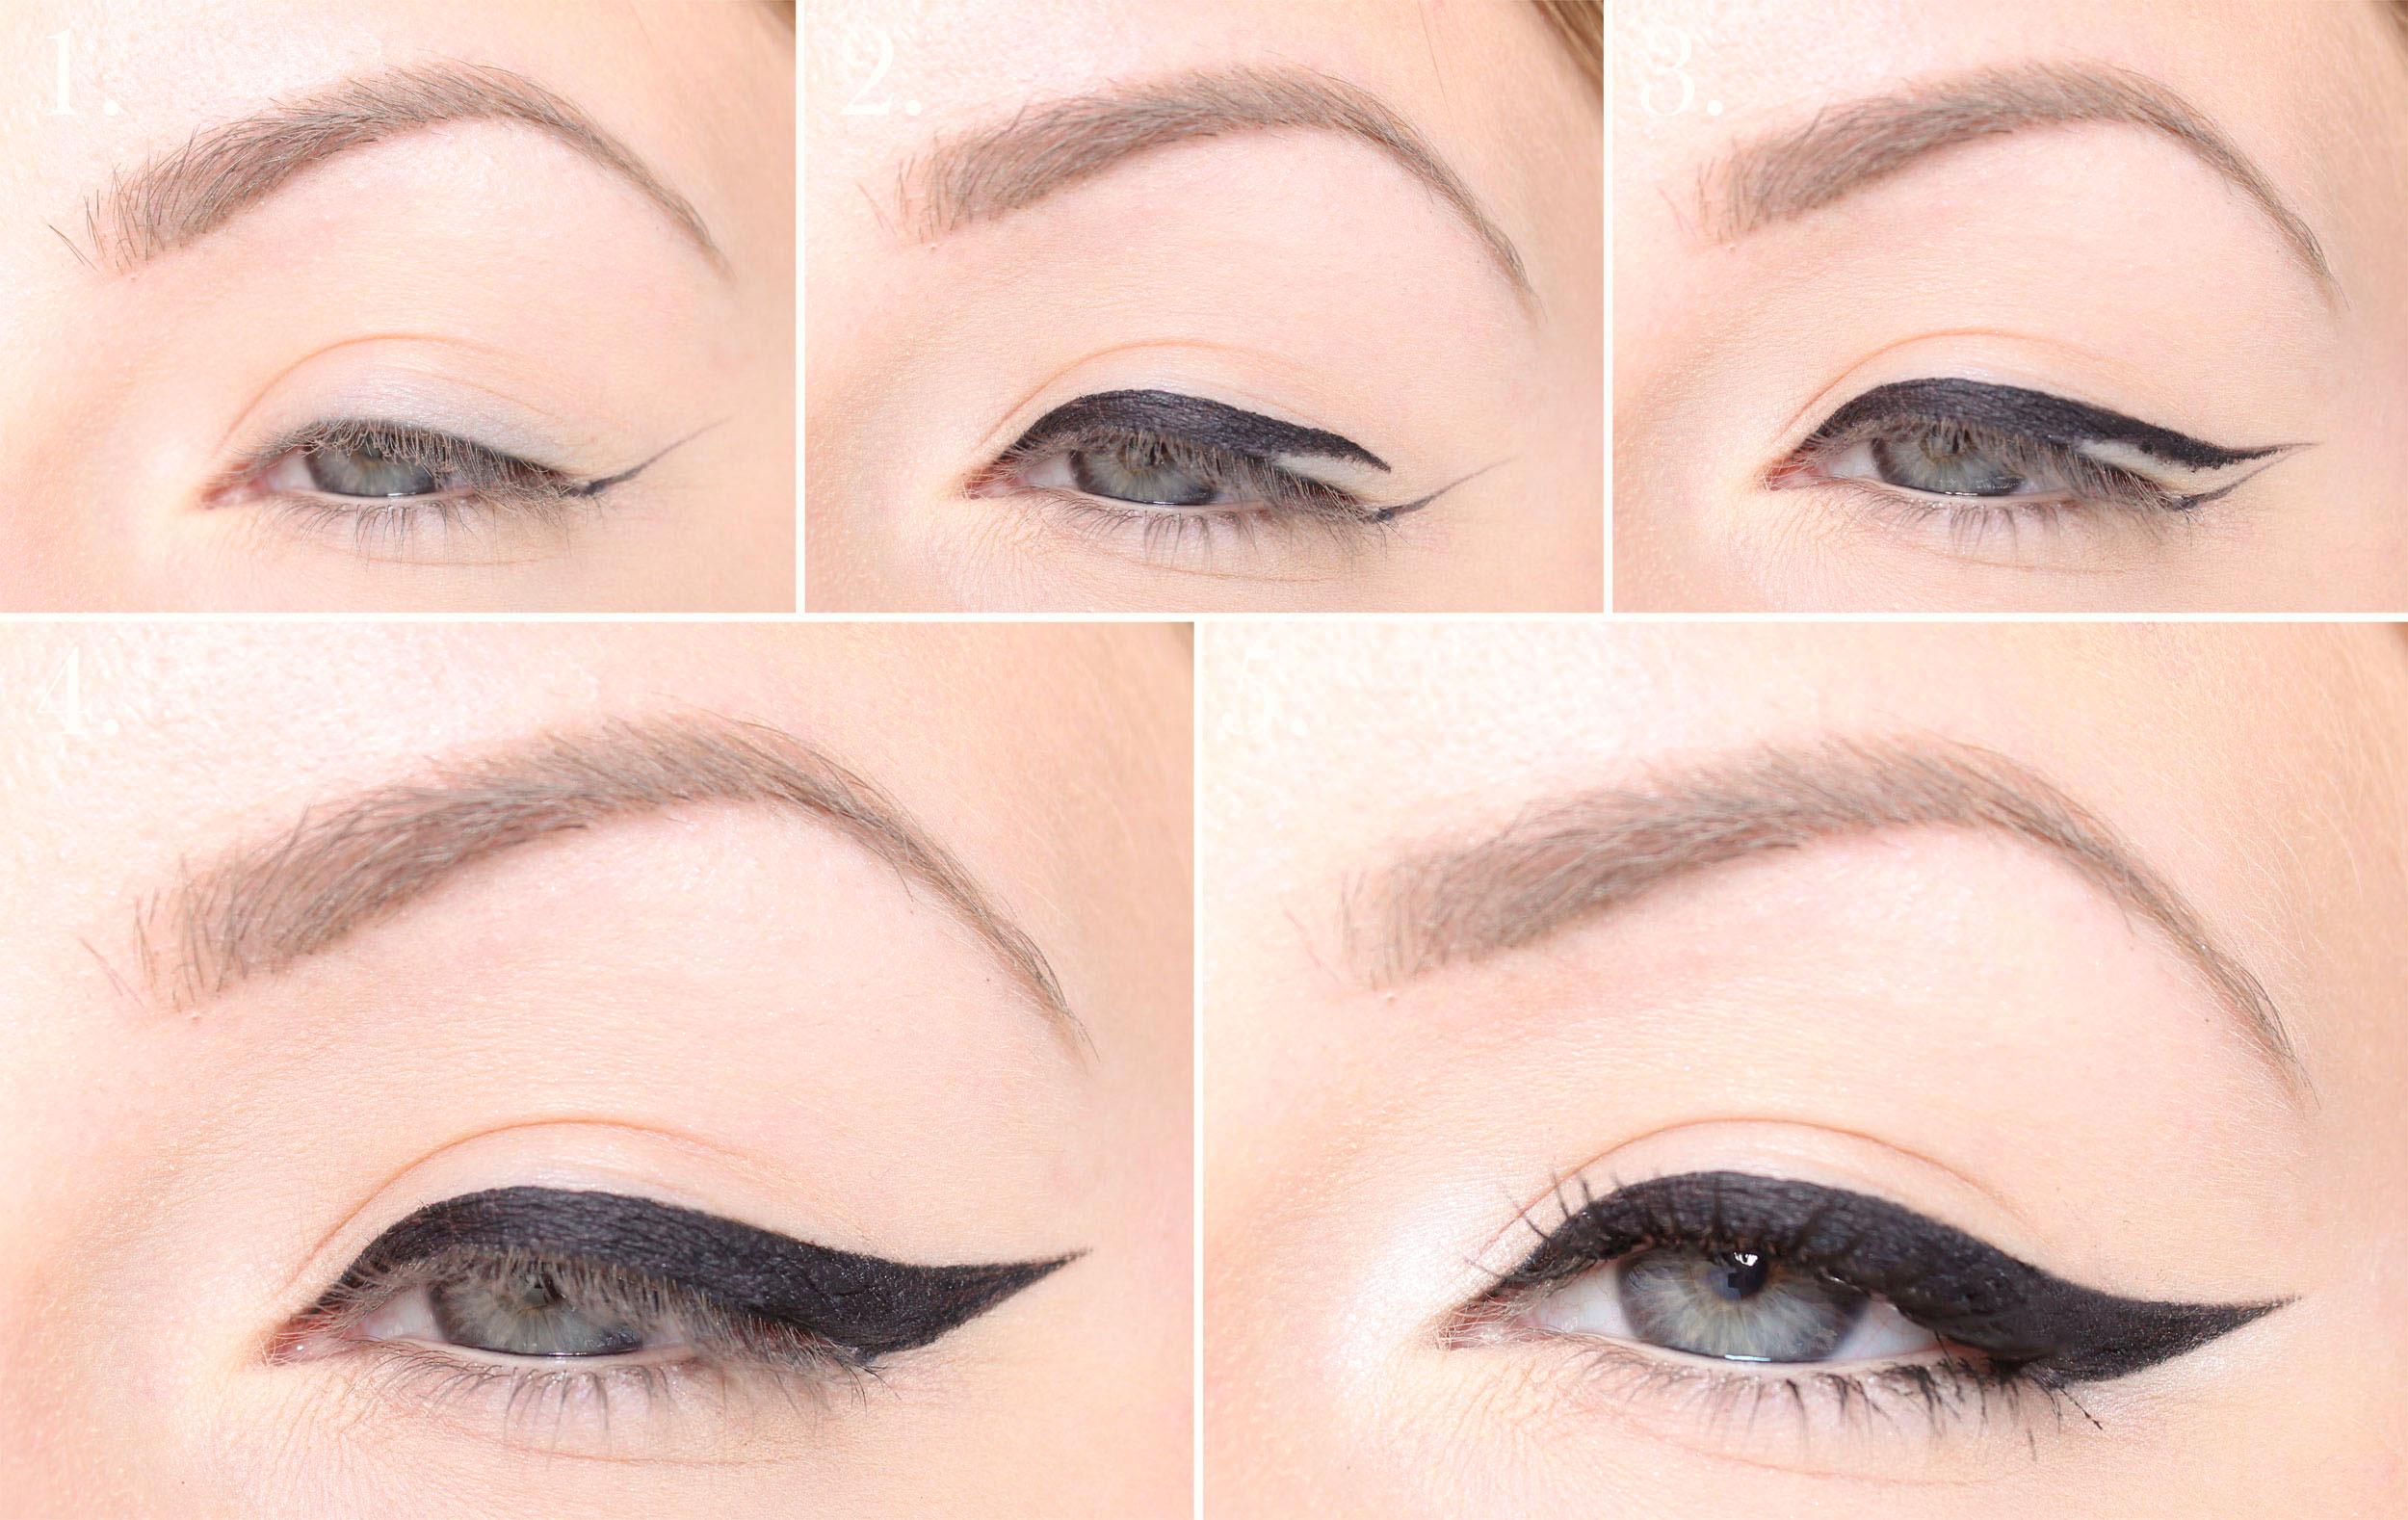 Eyeliner tutorial - How to apply eyeliner?